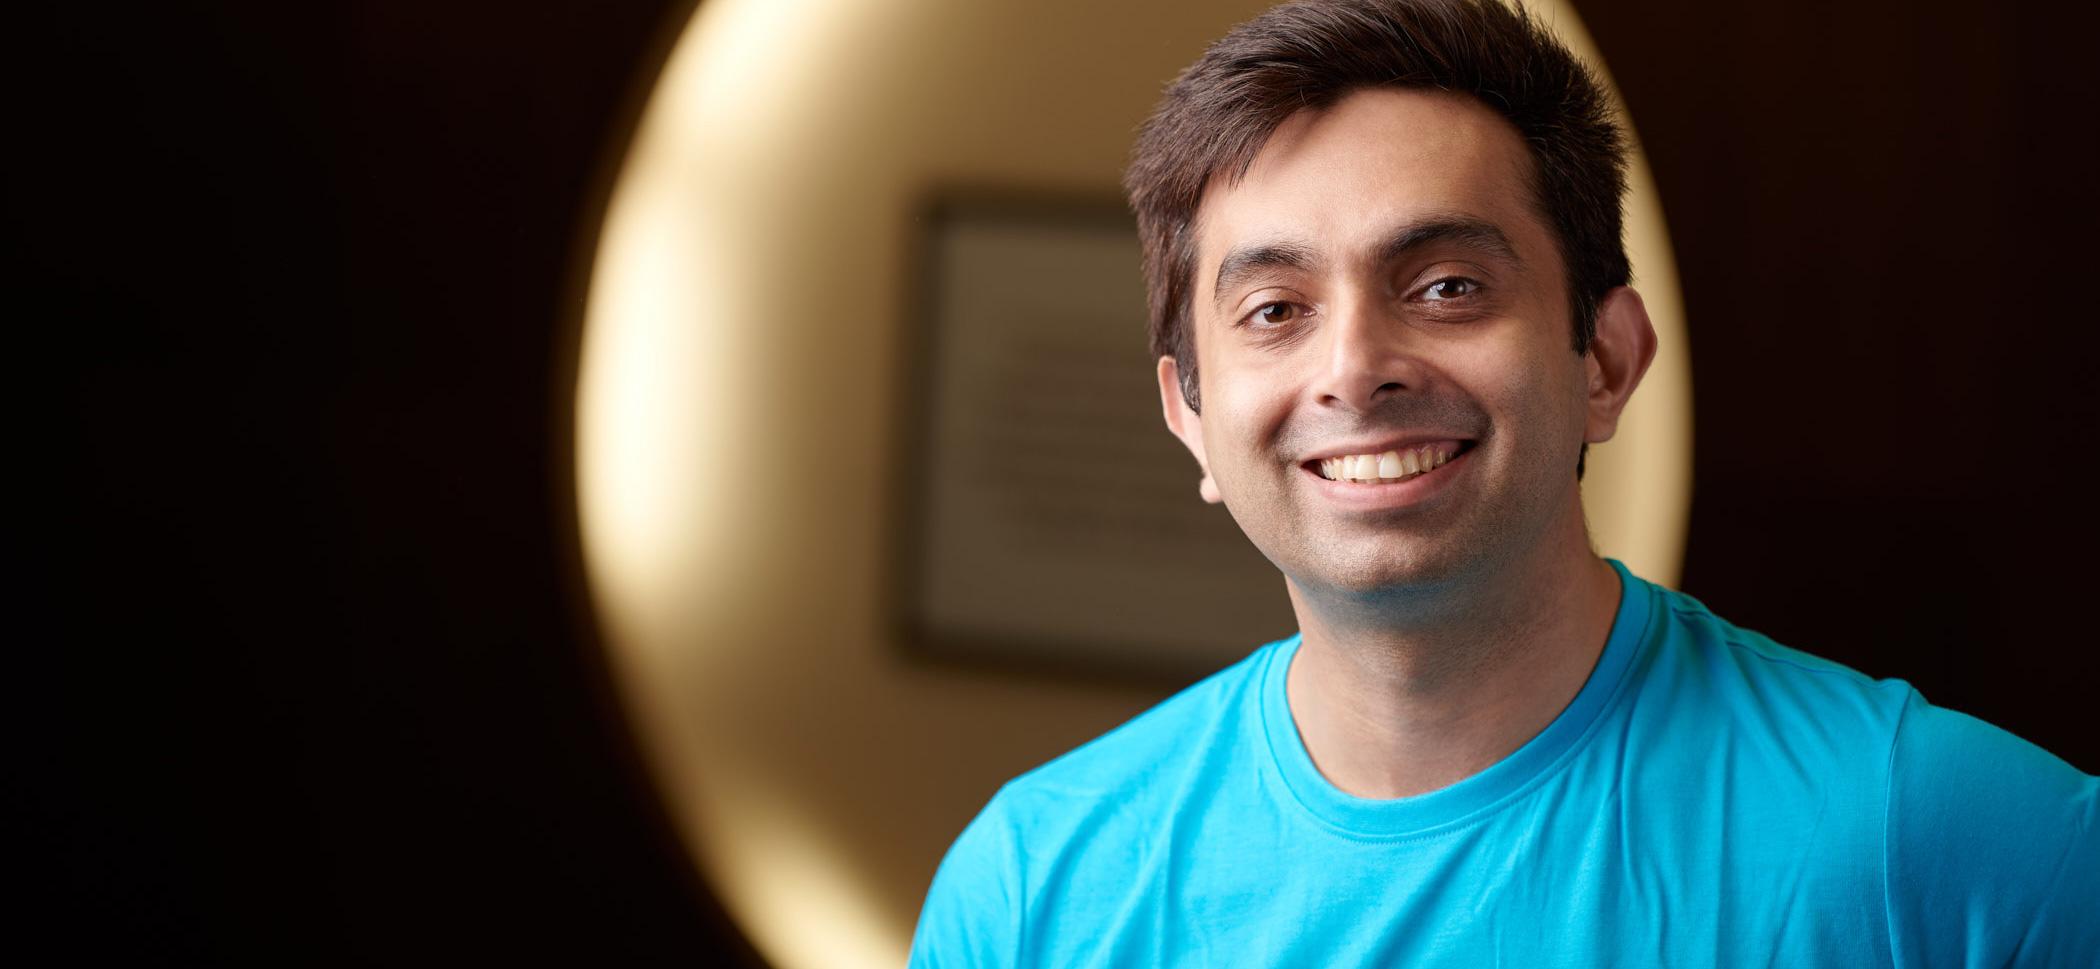 Radix Appoints Sandeep Ramchandani as CEO